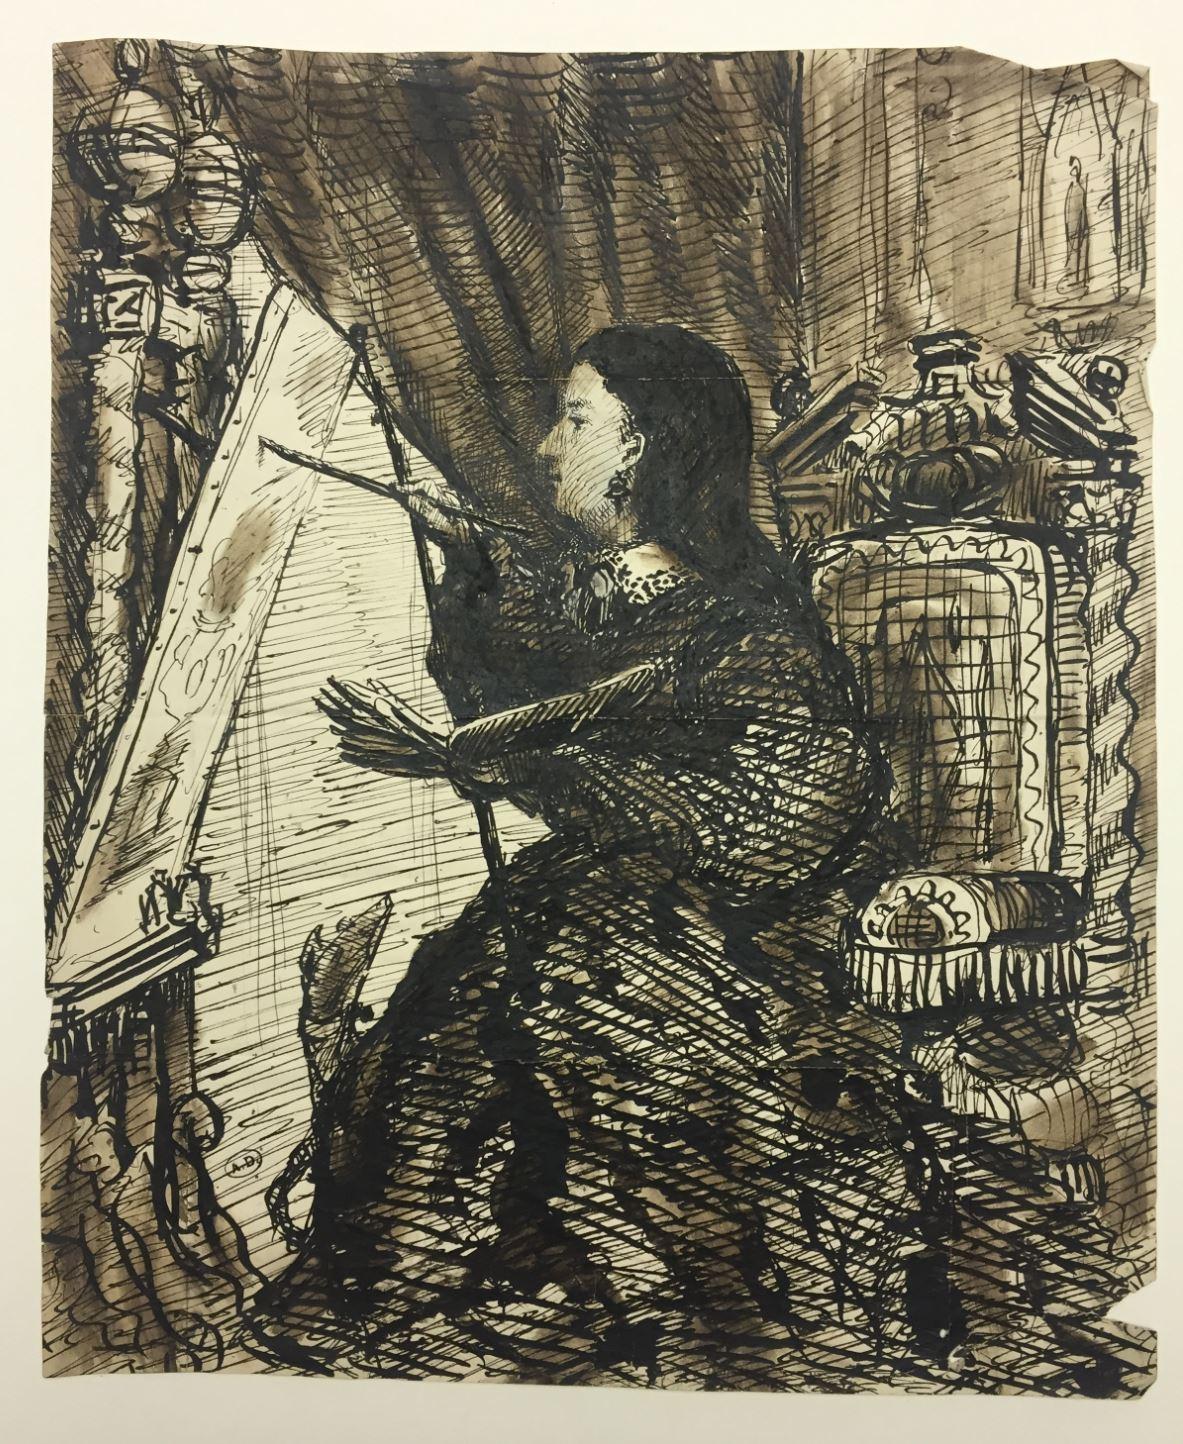 Juie Duvidal peignant Leopold Armand Hugo copyright Musee des Arts Decoratifs Paris JPG